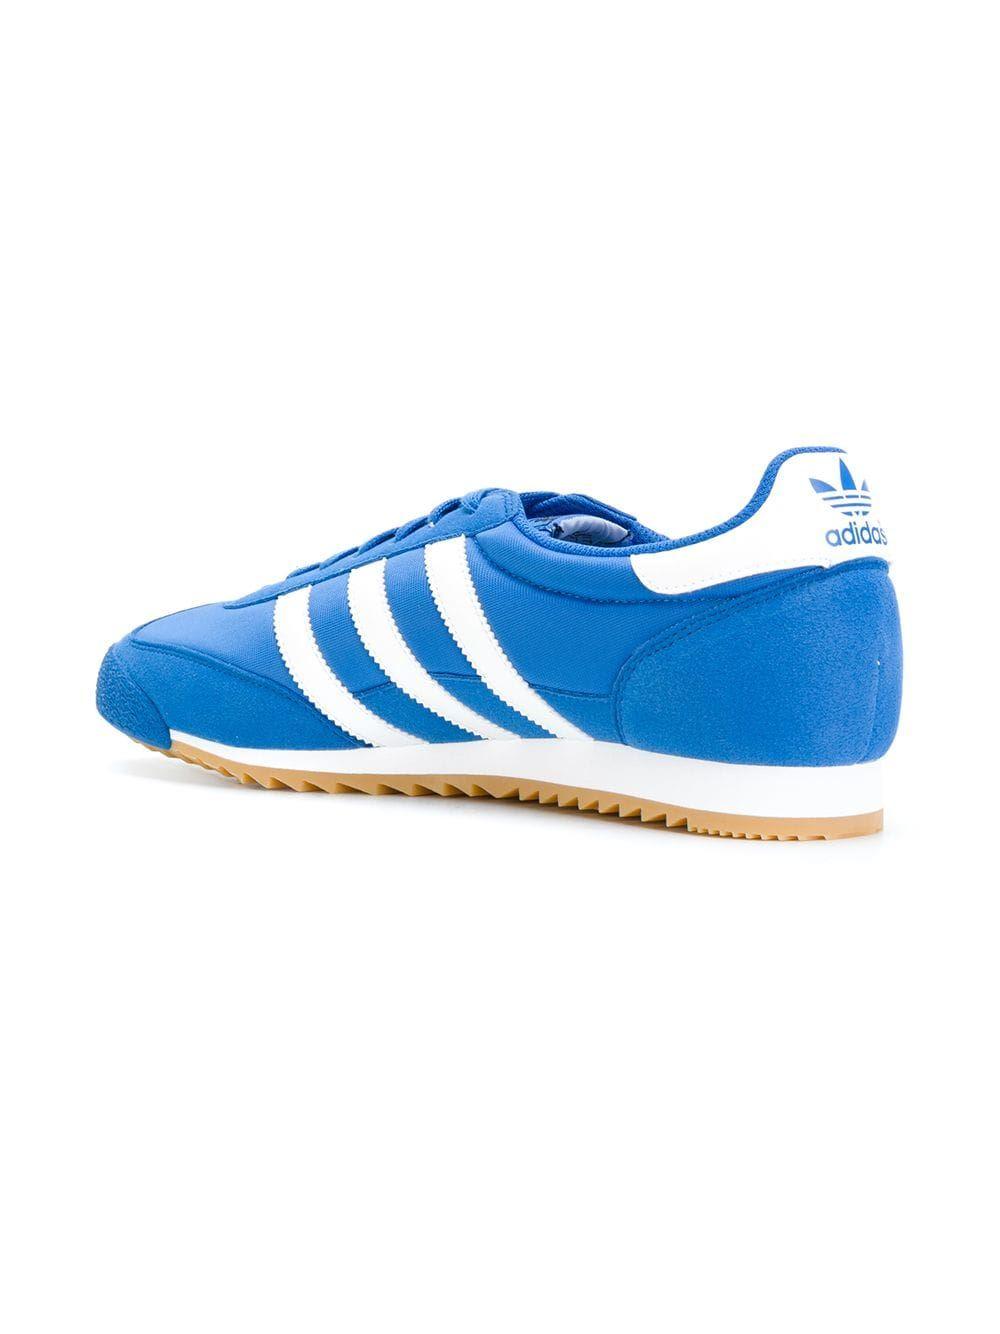 online store 49705 a9a0b Adidas Originals Dragon OG Trainer Core Blue White Gum UK 7-11